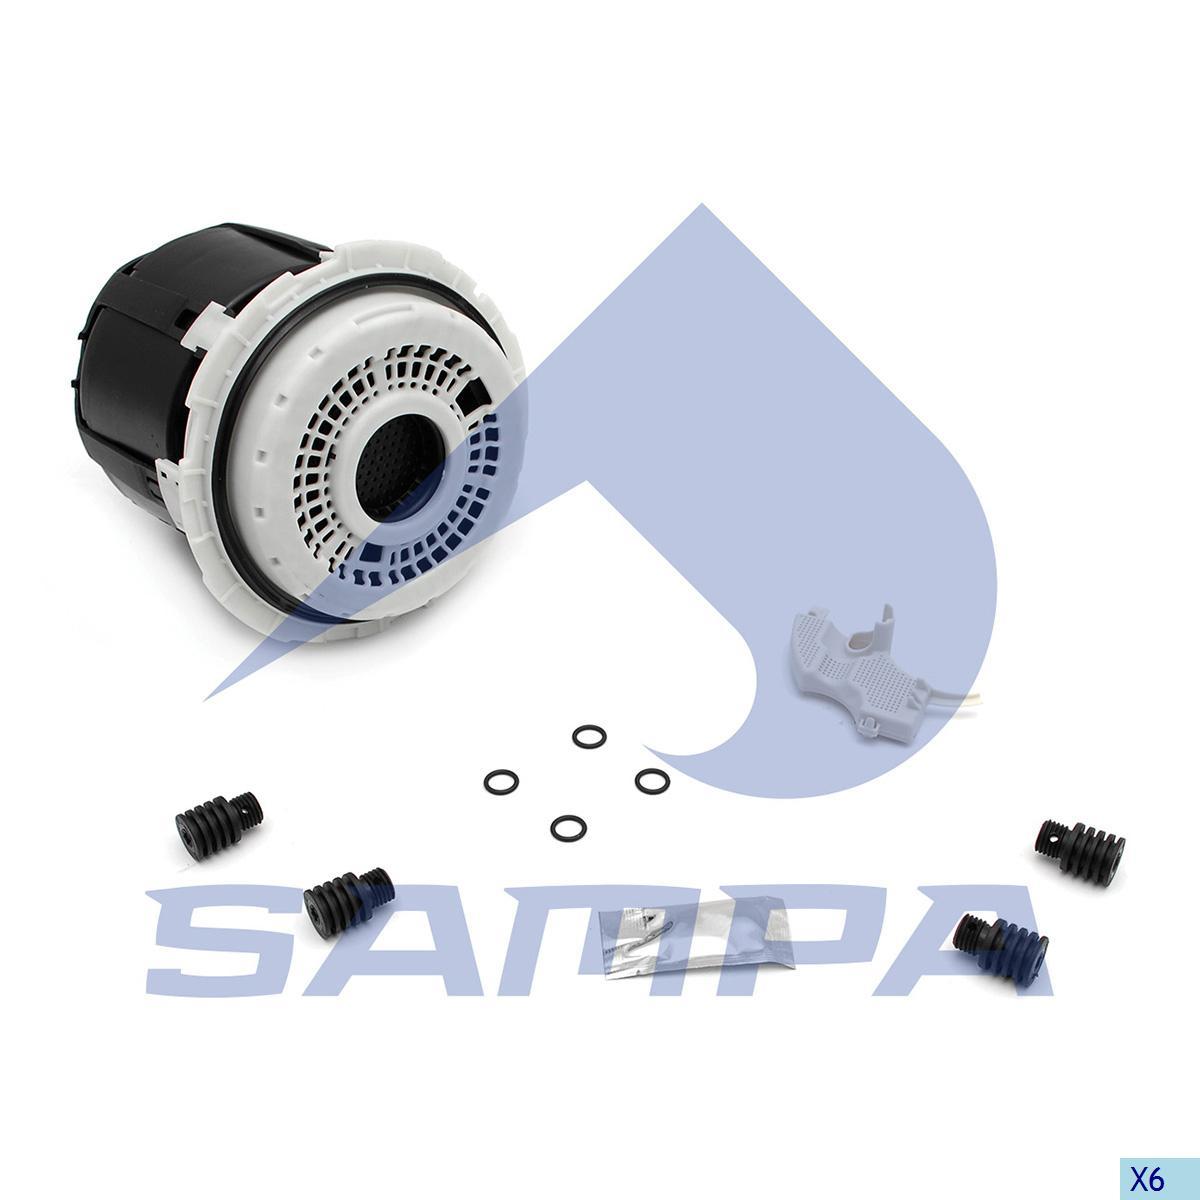 Air Dryer Cartridge, R.V.I., Compressed Air System